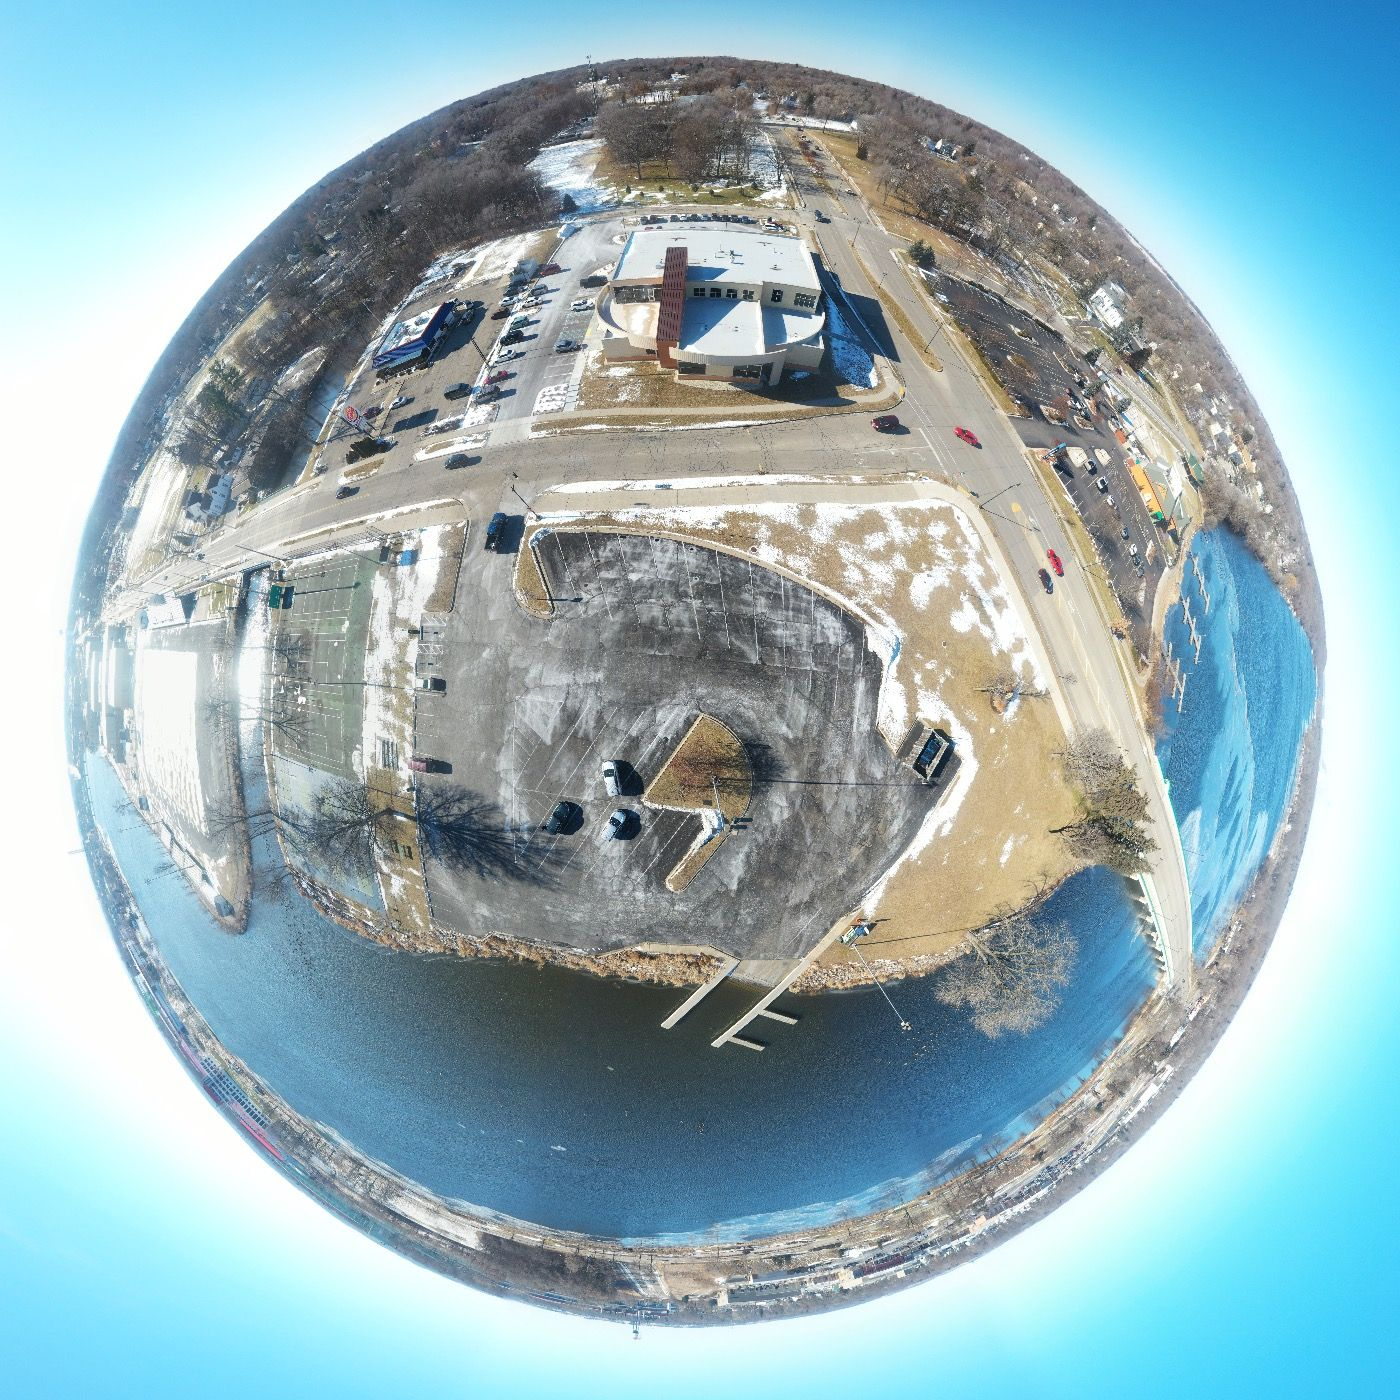 Beloit Christmas 2020 School District of Beloit Welcome Center in 2020   Drone